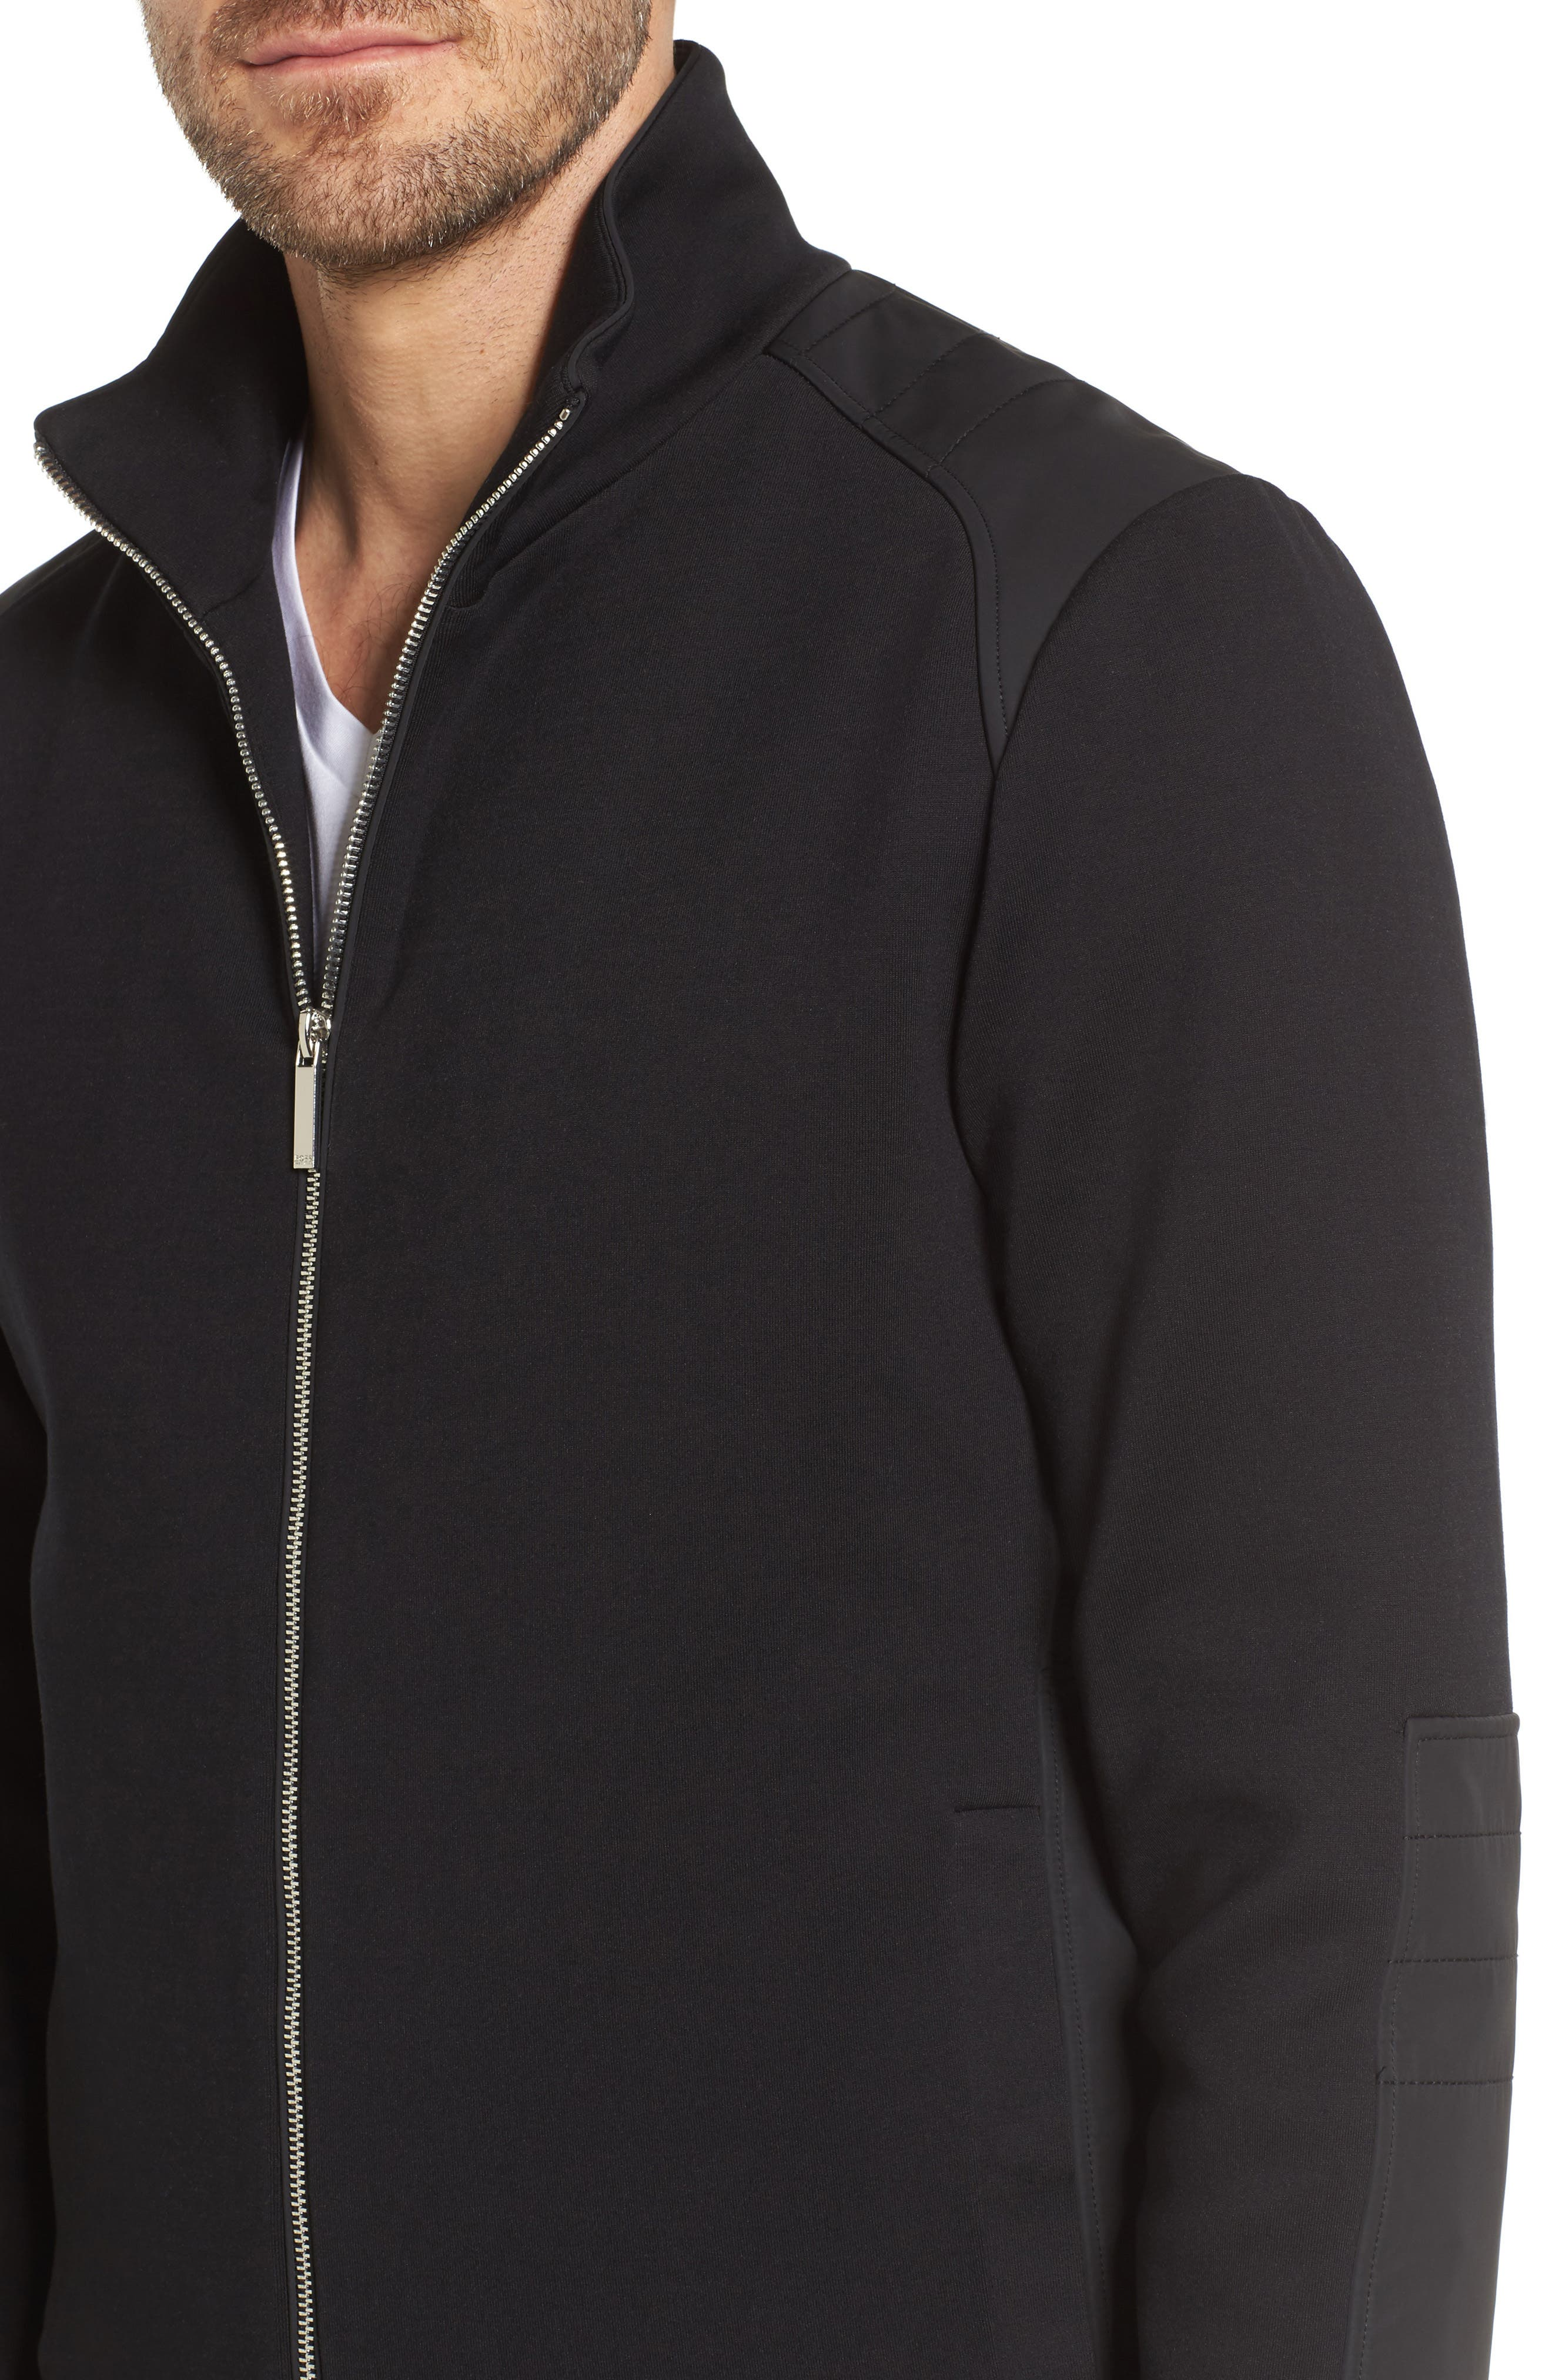 Soule Mercedes Slim Fit Zip Jacket,                             Alternate thumbnail 4, color,                             Black